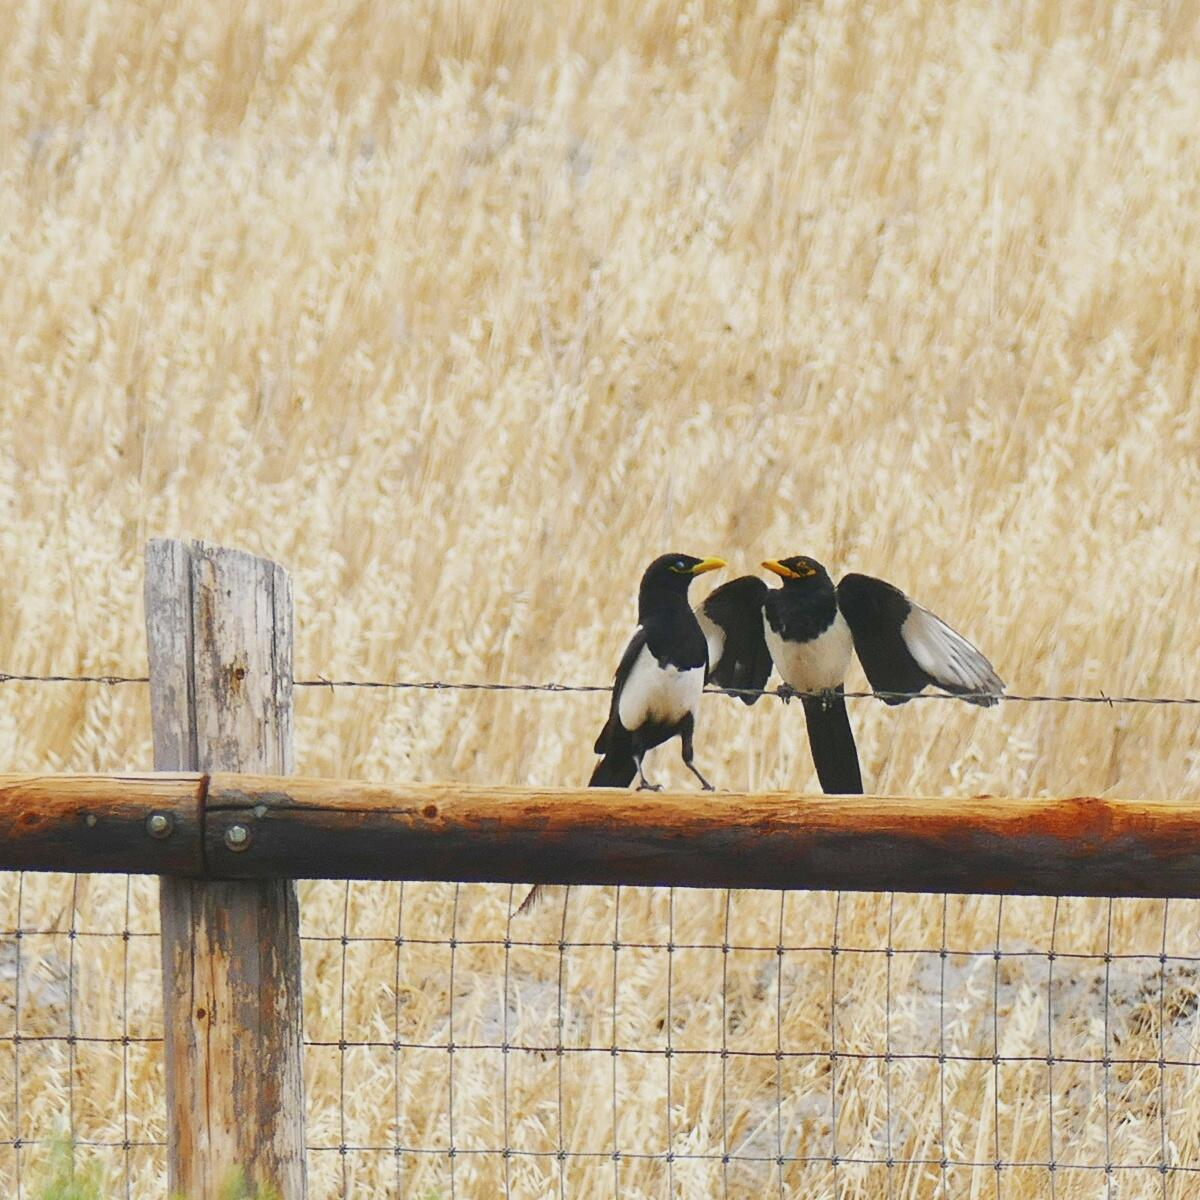 Noah's view of a pair of Yellow-billed Magpies along California's Highway 101. Noah Strycker